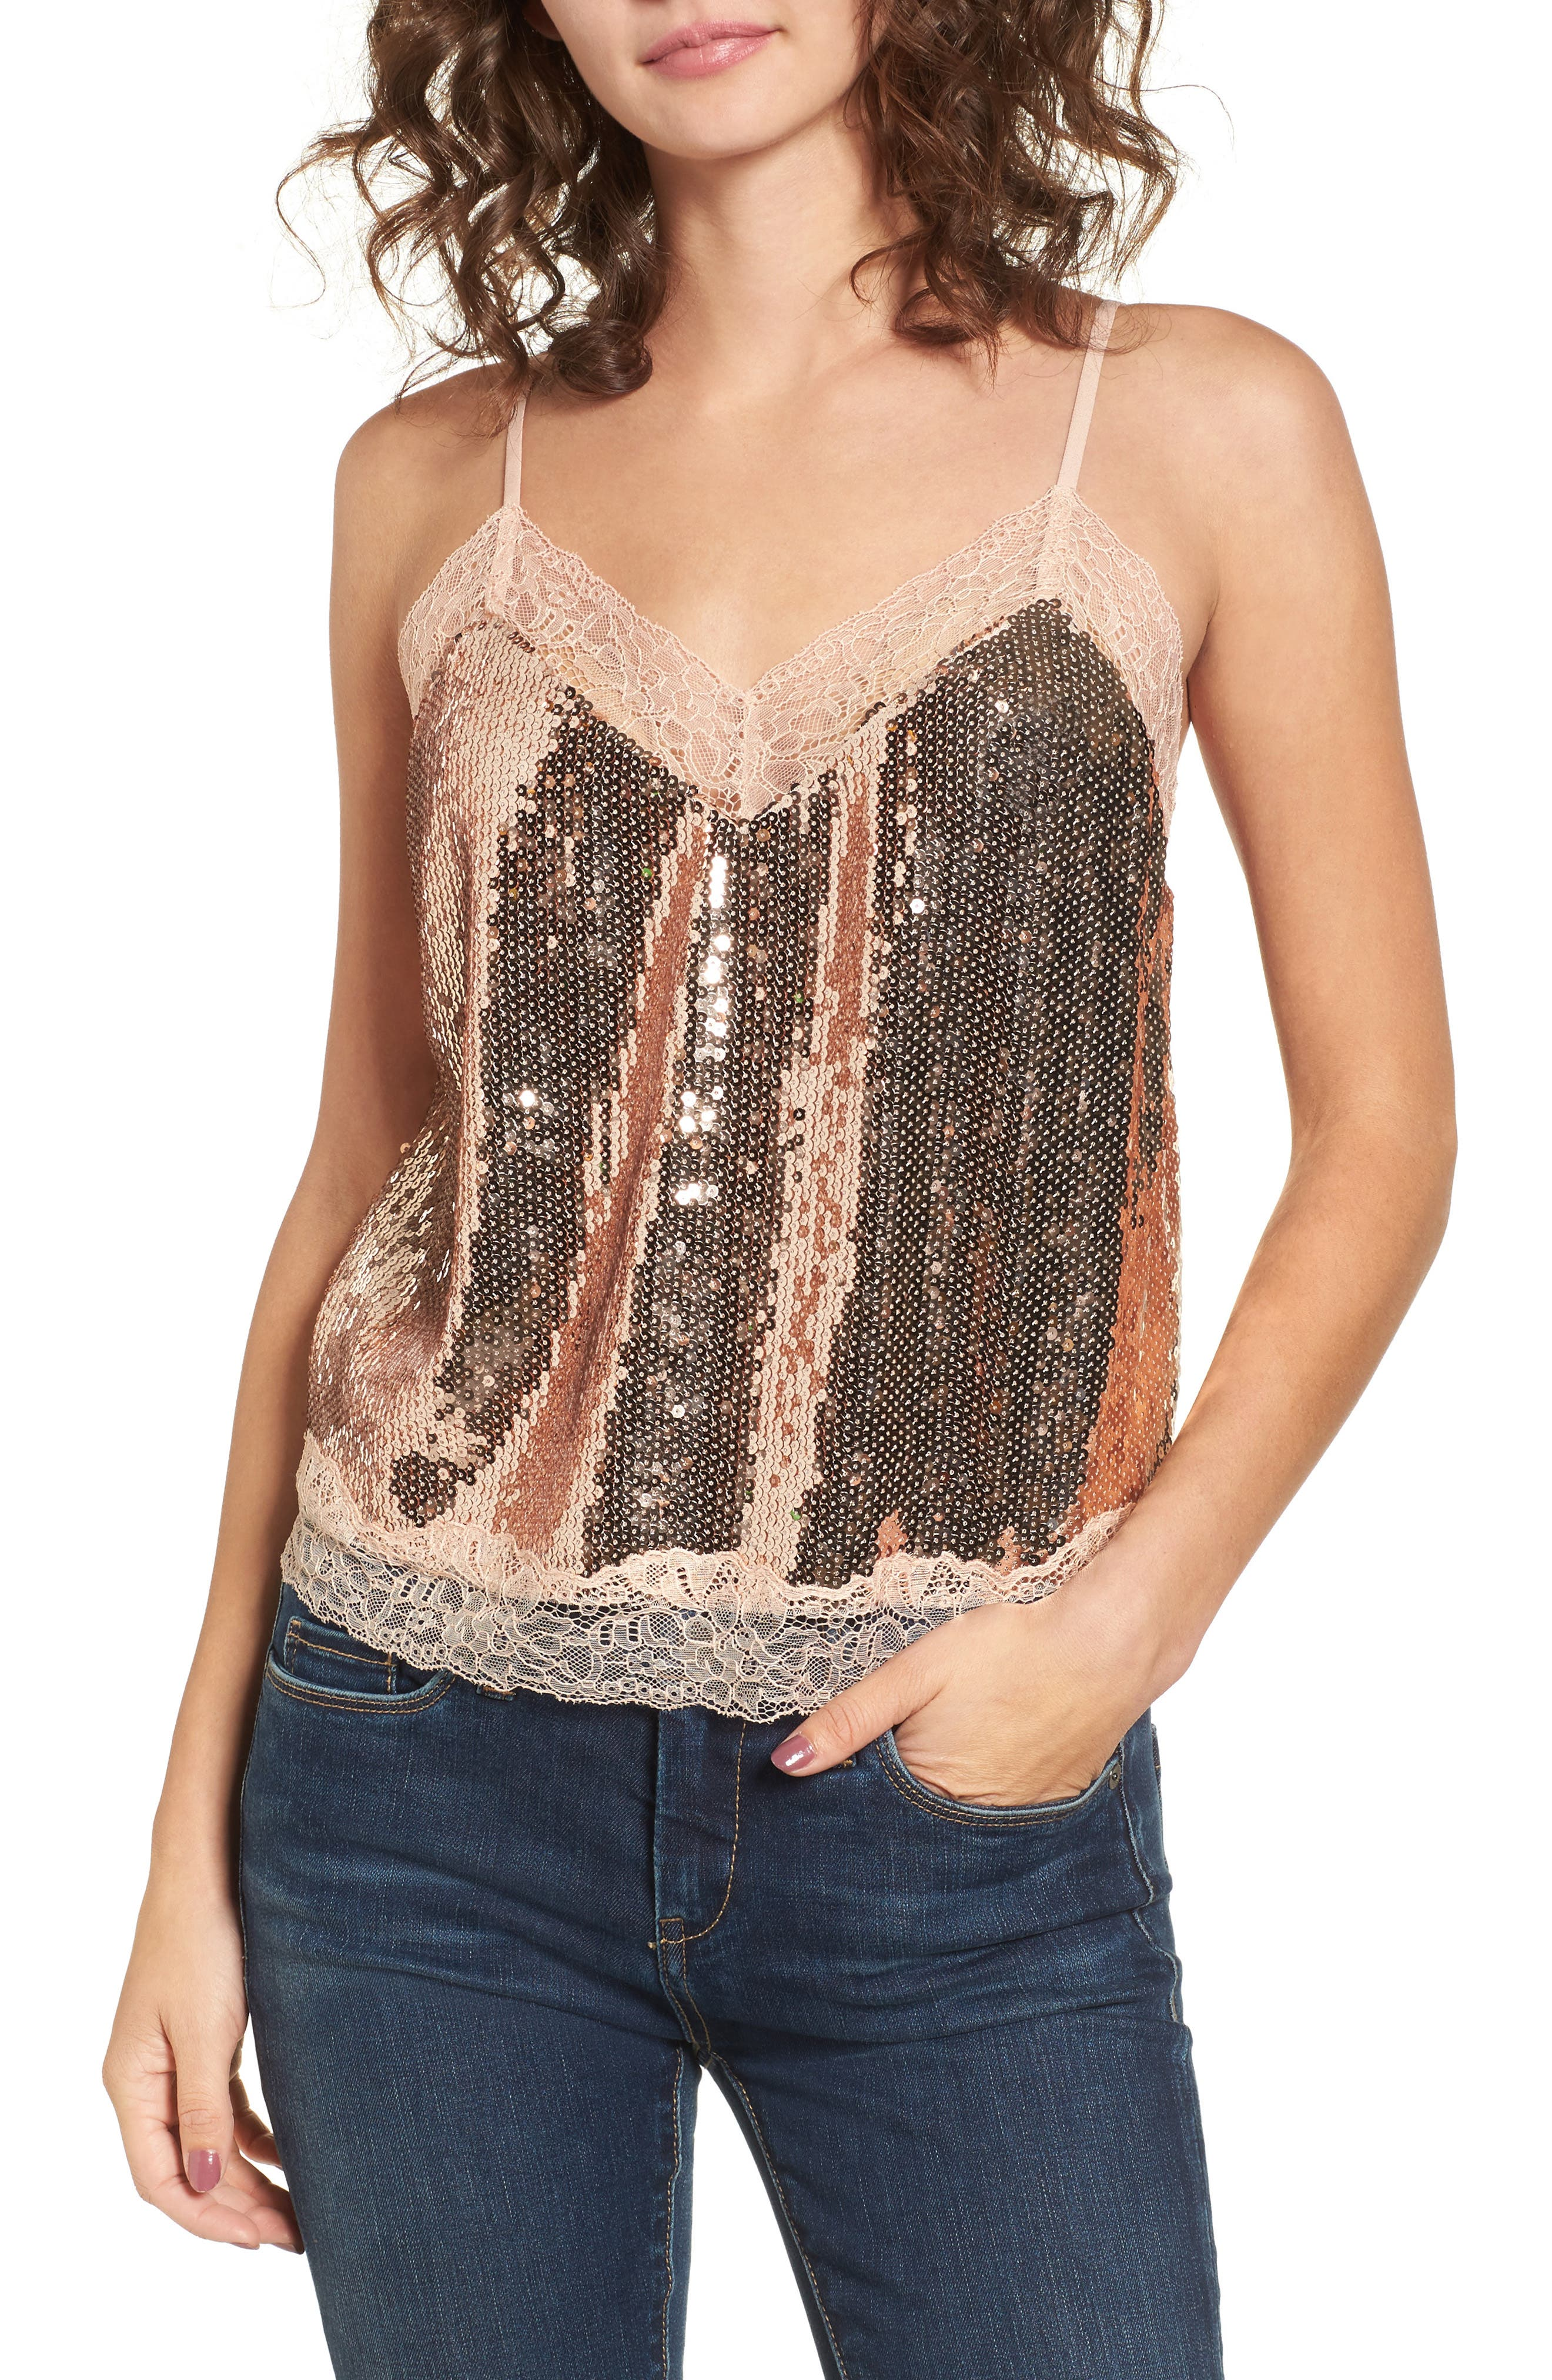 Alternate Image 1 Selected - Soprano Lace Trim Sequin Camisole Top